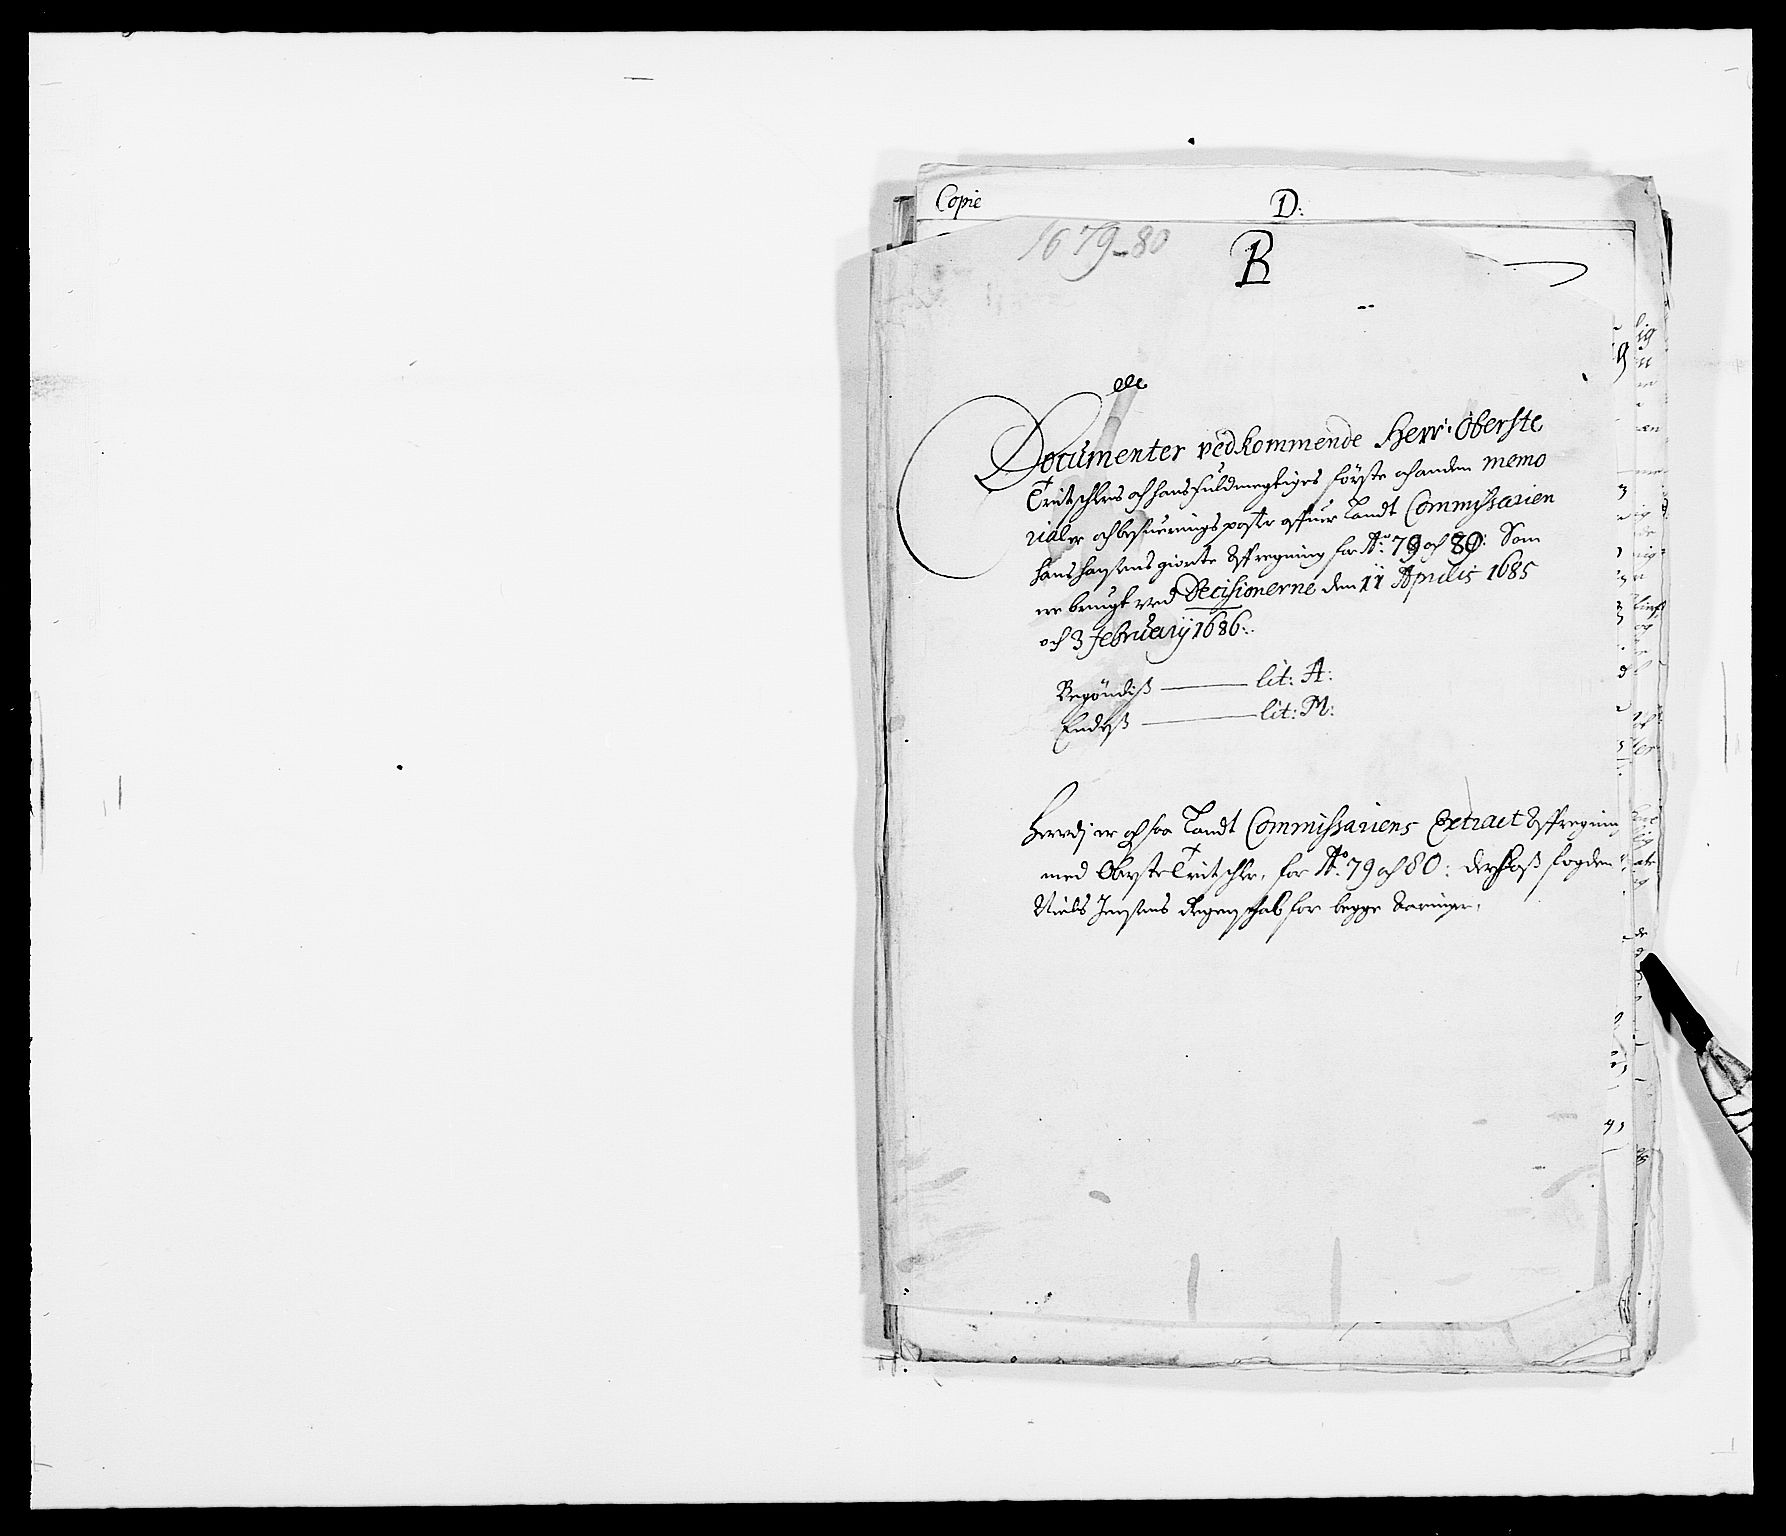 RA, Rentekammeret inntil 1814, Reviderte regnskaper, Fogderegnskap, R32/L1849: Fogderegnskap Jarlsberg grevskap, 1679-1680, s. 1